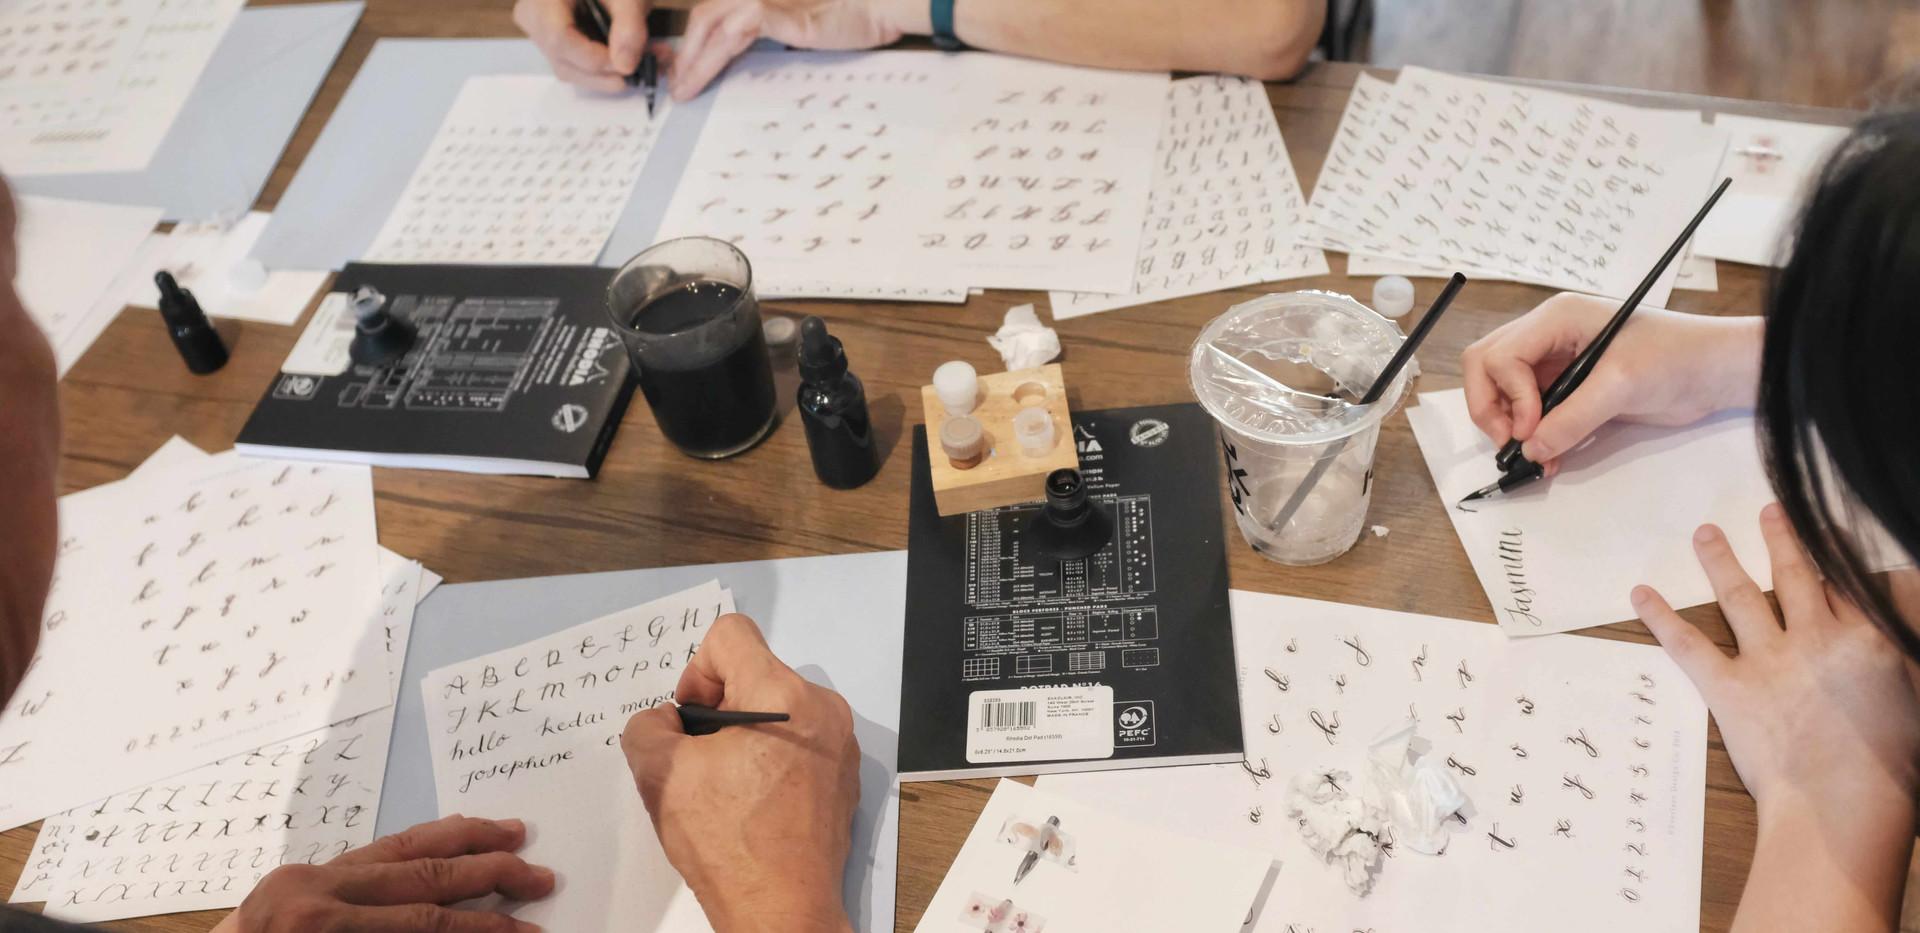 jakarta-calligraphy-class-everlacedesign